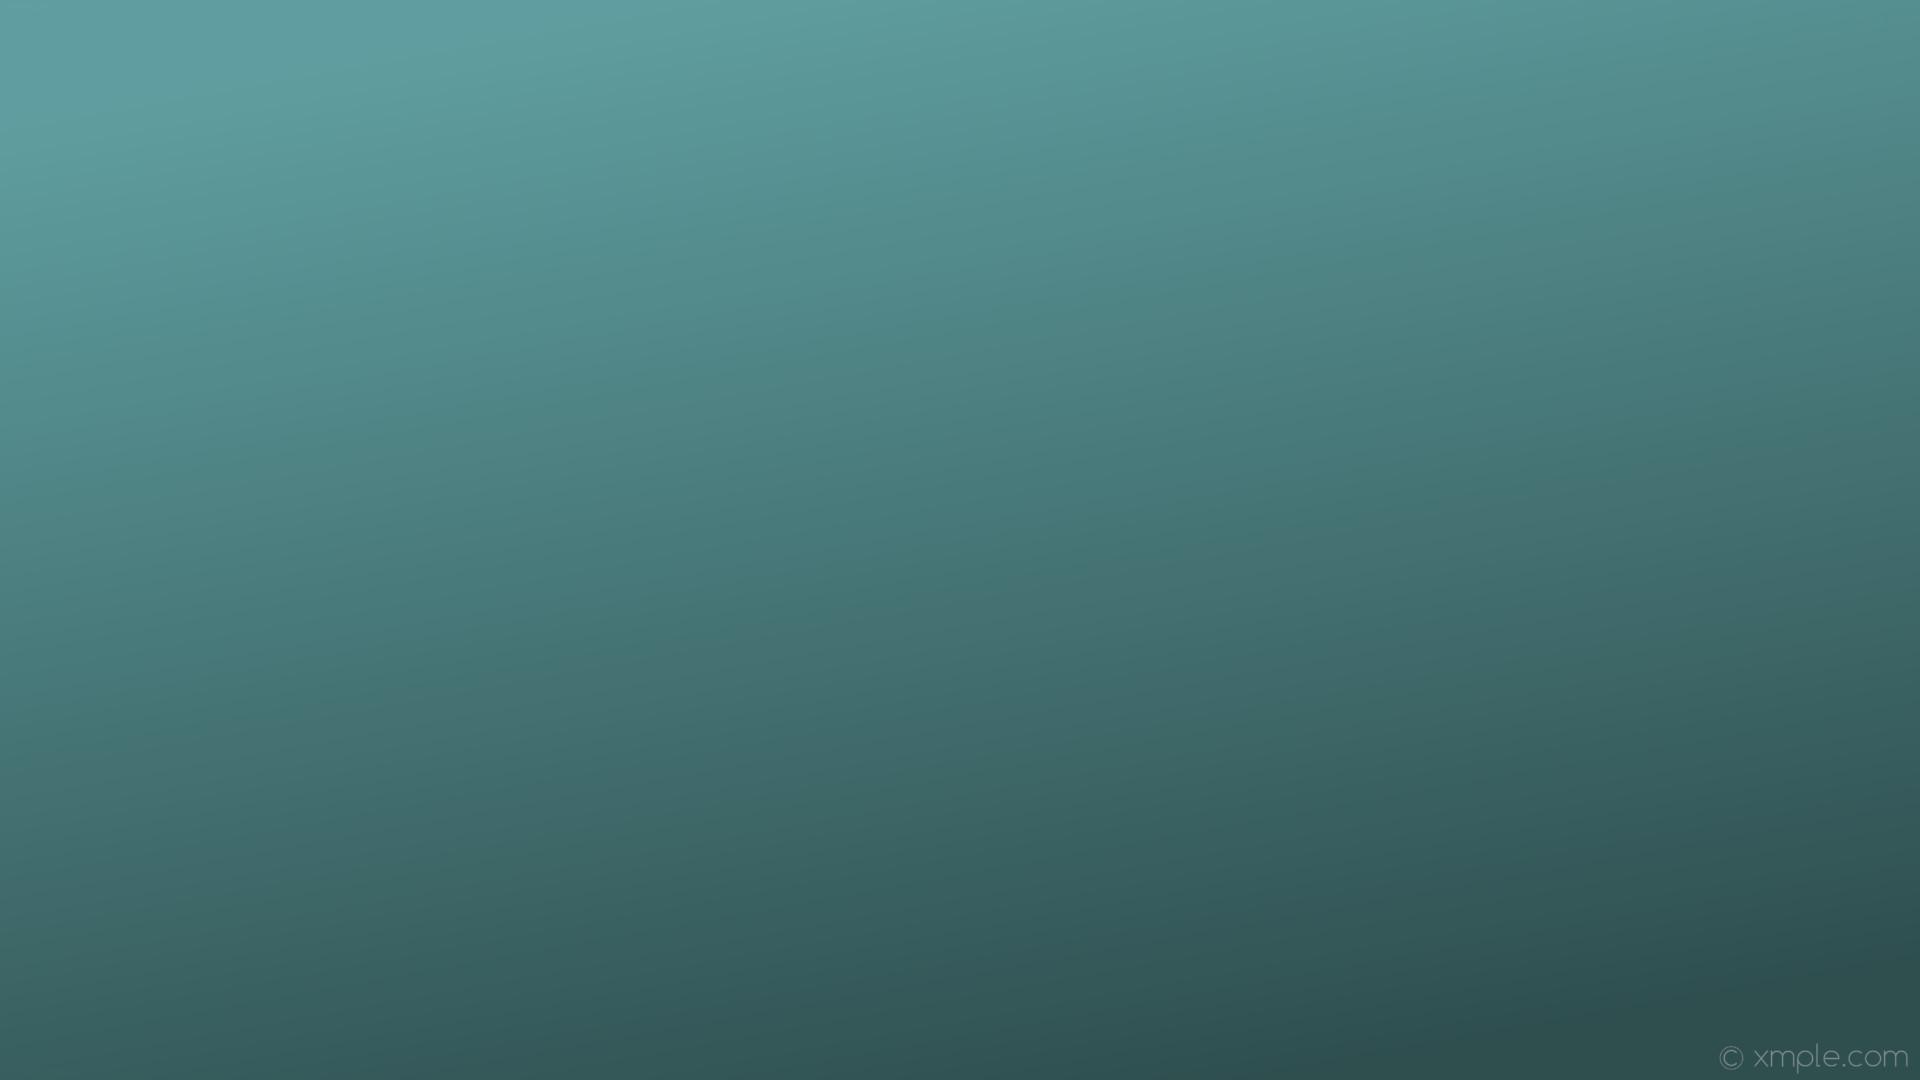 wallpaper gradient linear grey blue dark slate gray cadet blue #2f4f4f  #5f9ea0 300°